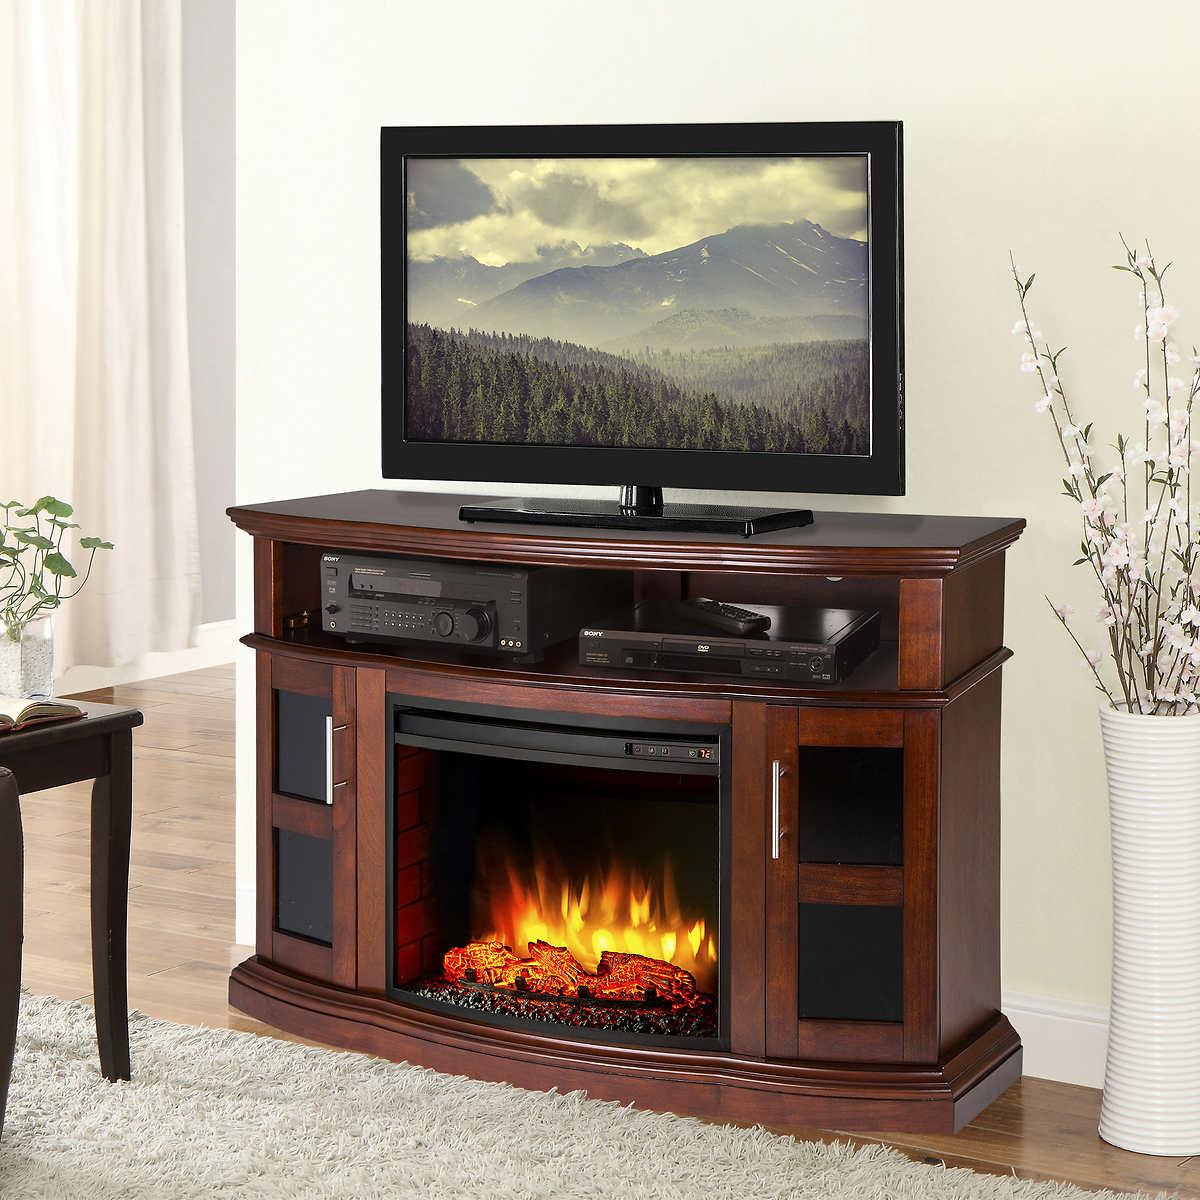 muskoka sloan 53 in media electric fireplace in a rustic brown